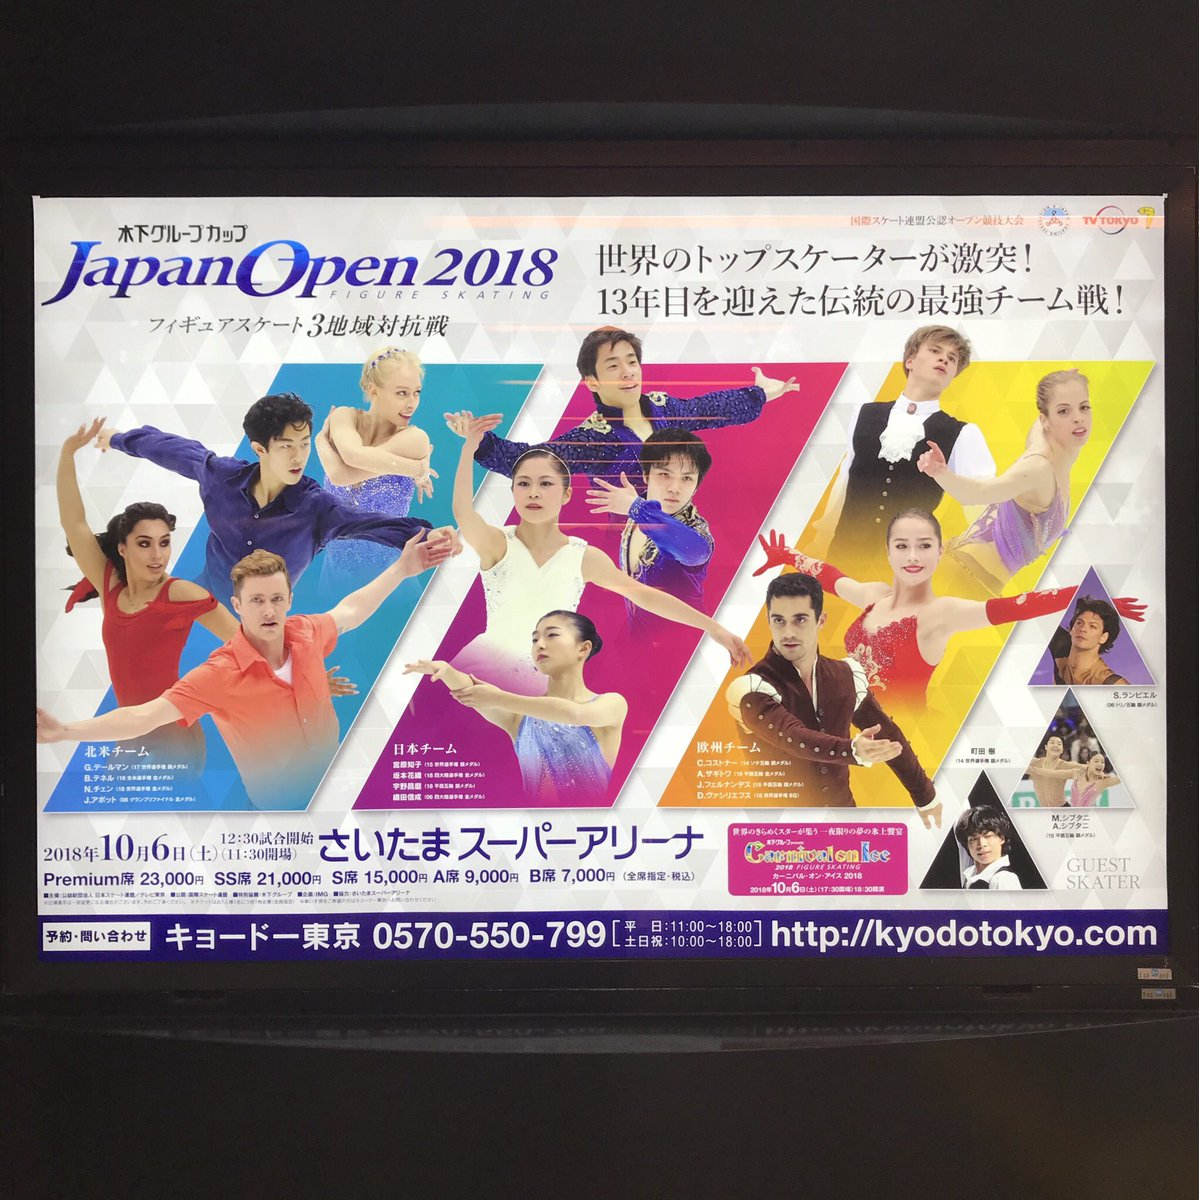 Japan Open 2018 | 6 октября 2018 | Saitama Super Arena DngD7y7VAAERrvo